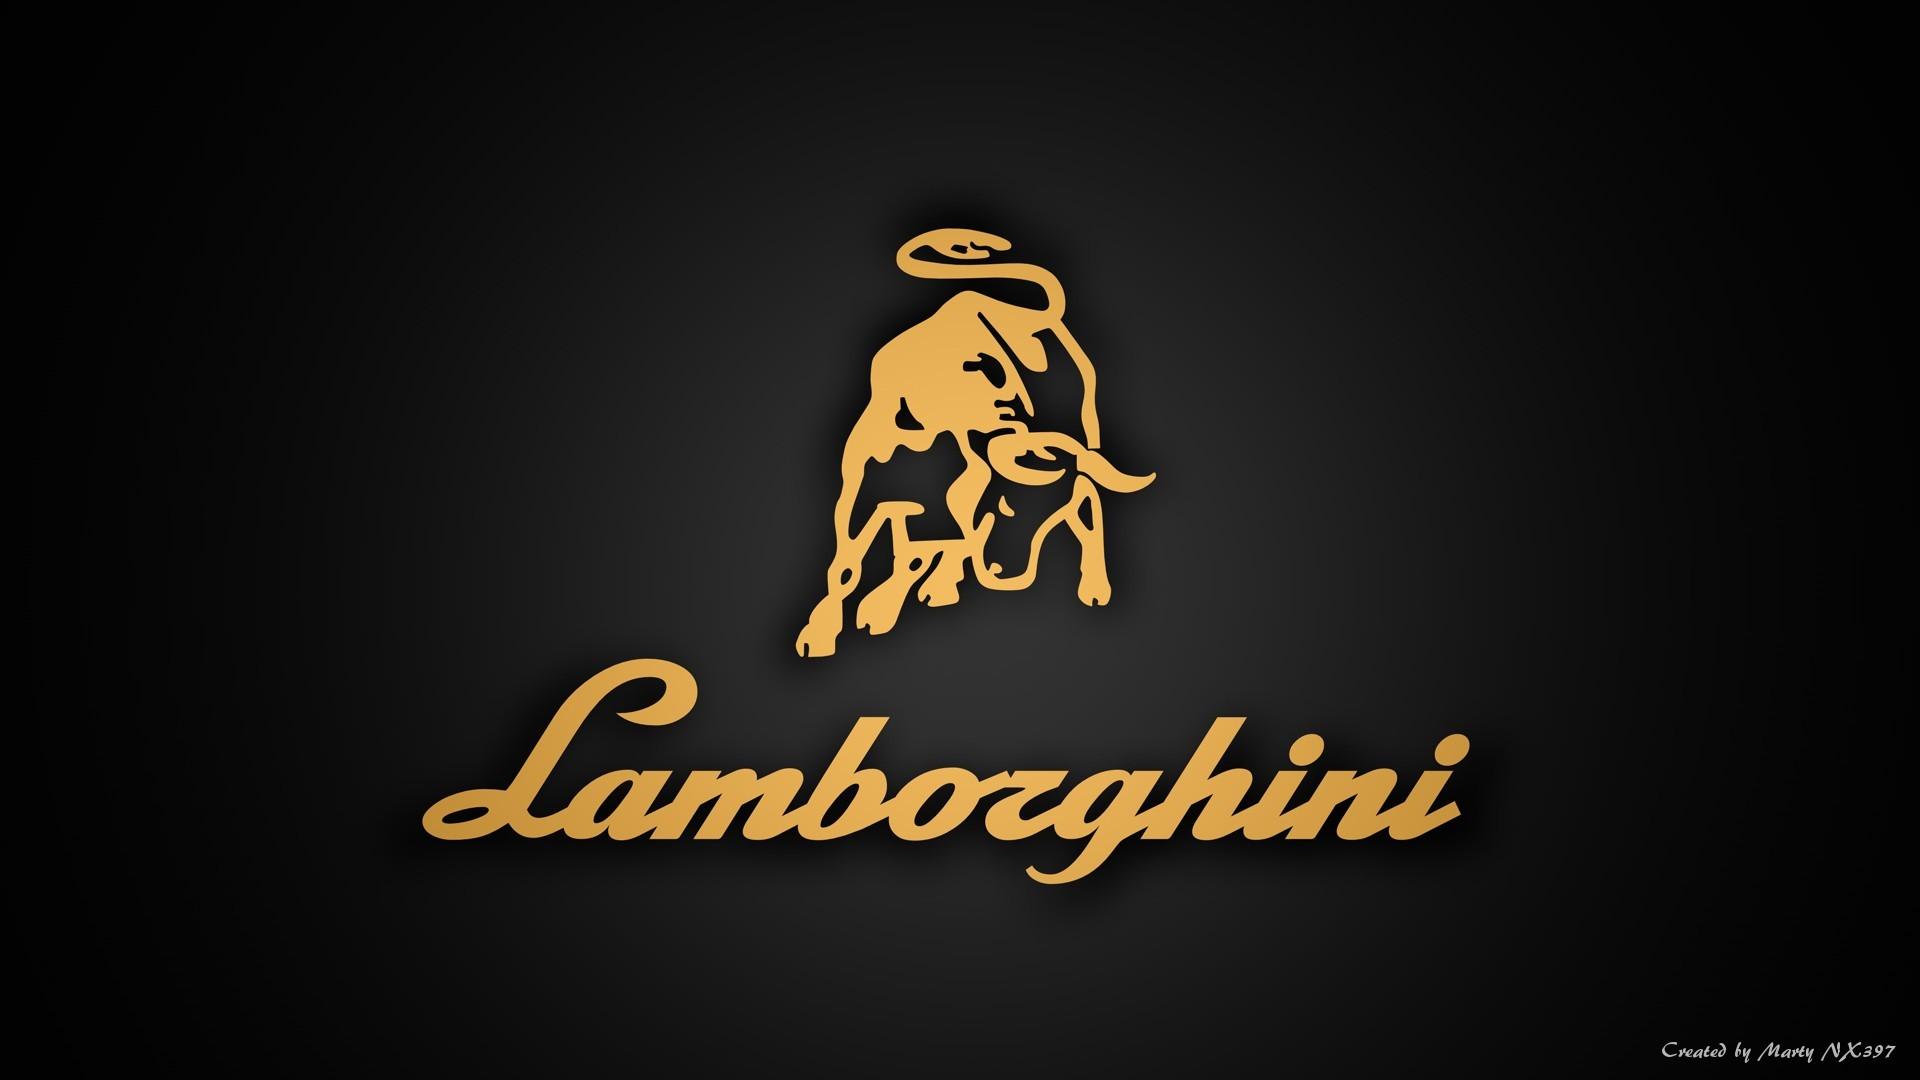 hd lamborghini logo Pictures Of Cars Hd 640×1136 Lamborghini Logo Wallpaper  (51 Wallpapers